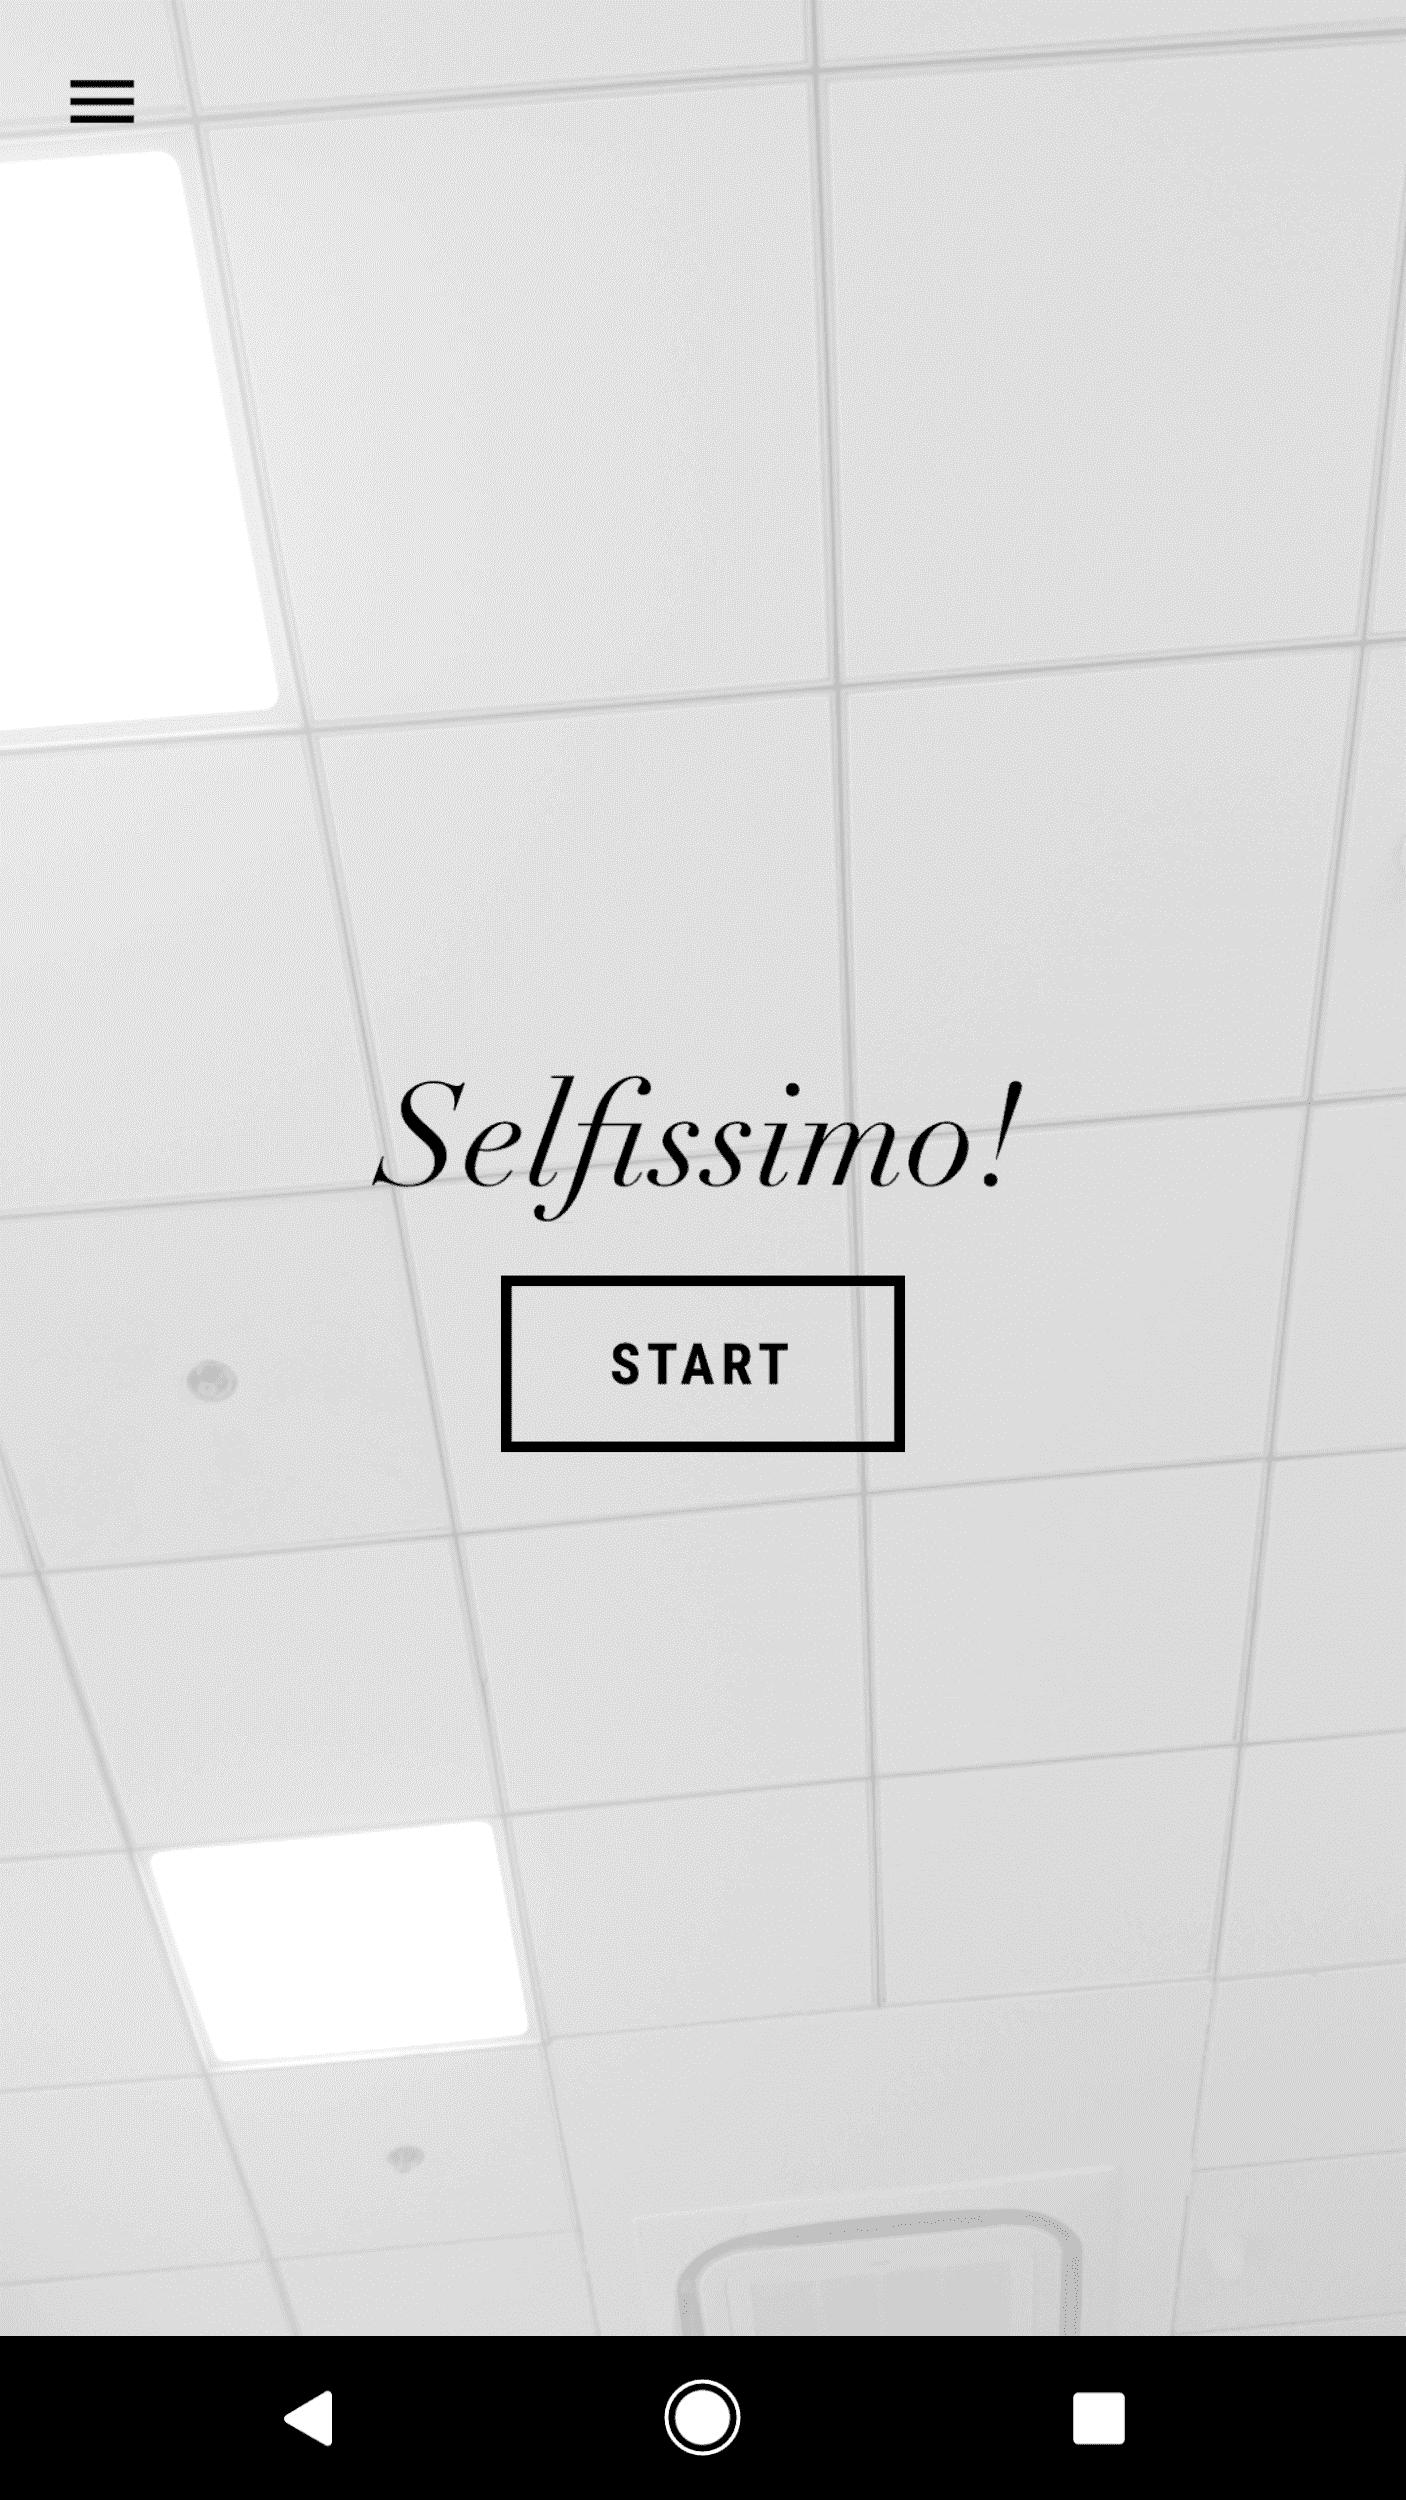 selfissimo google new app